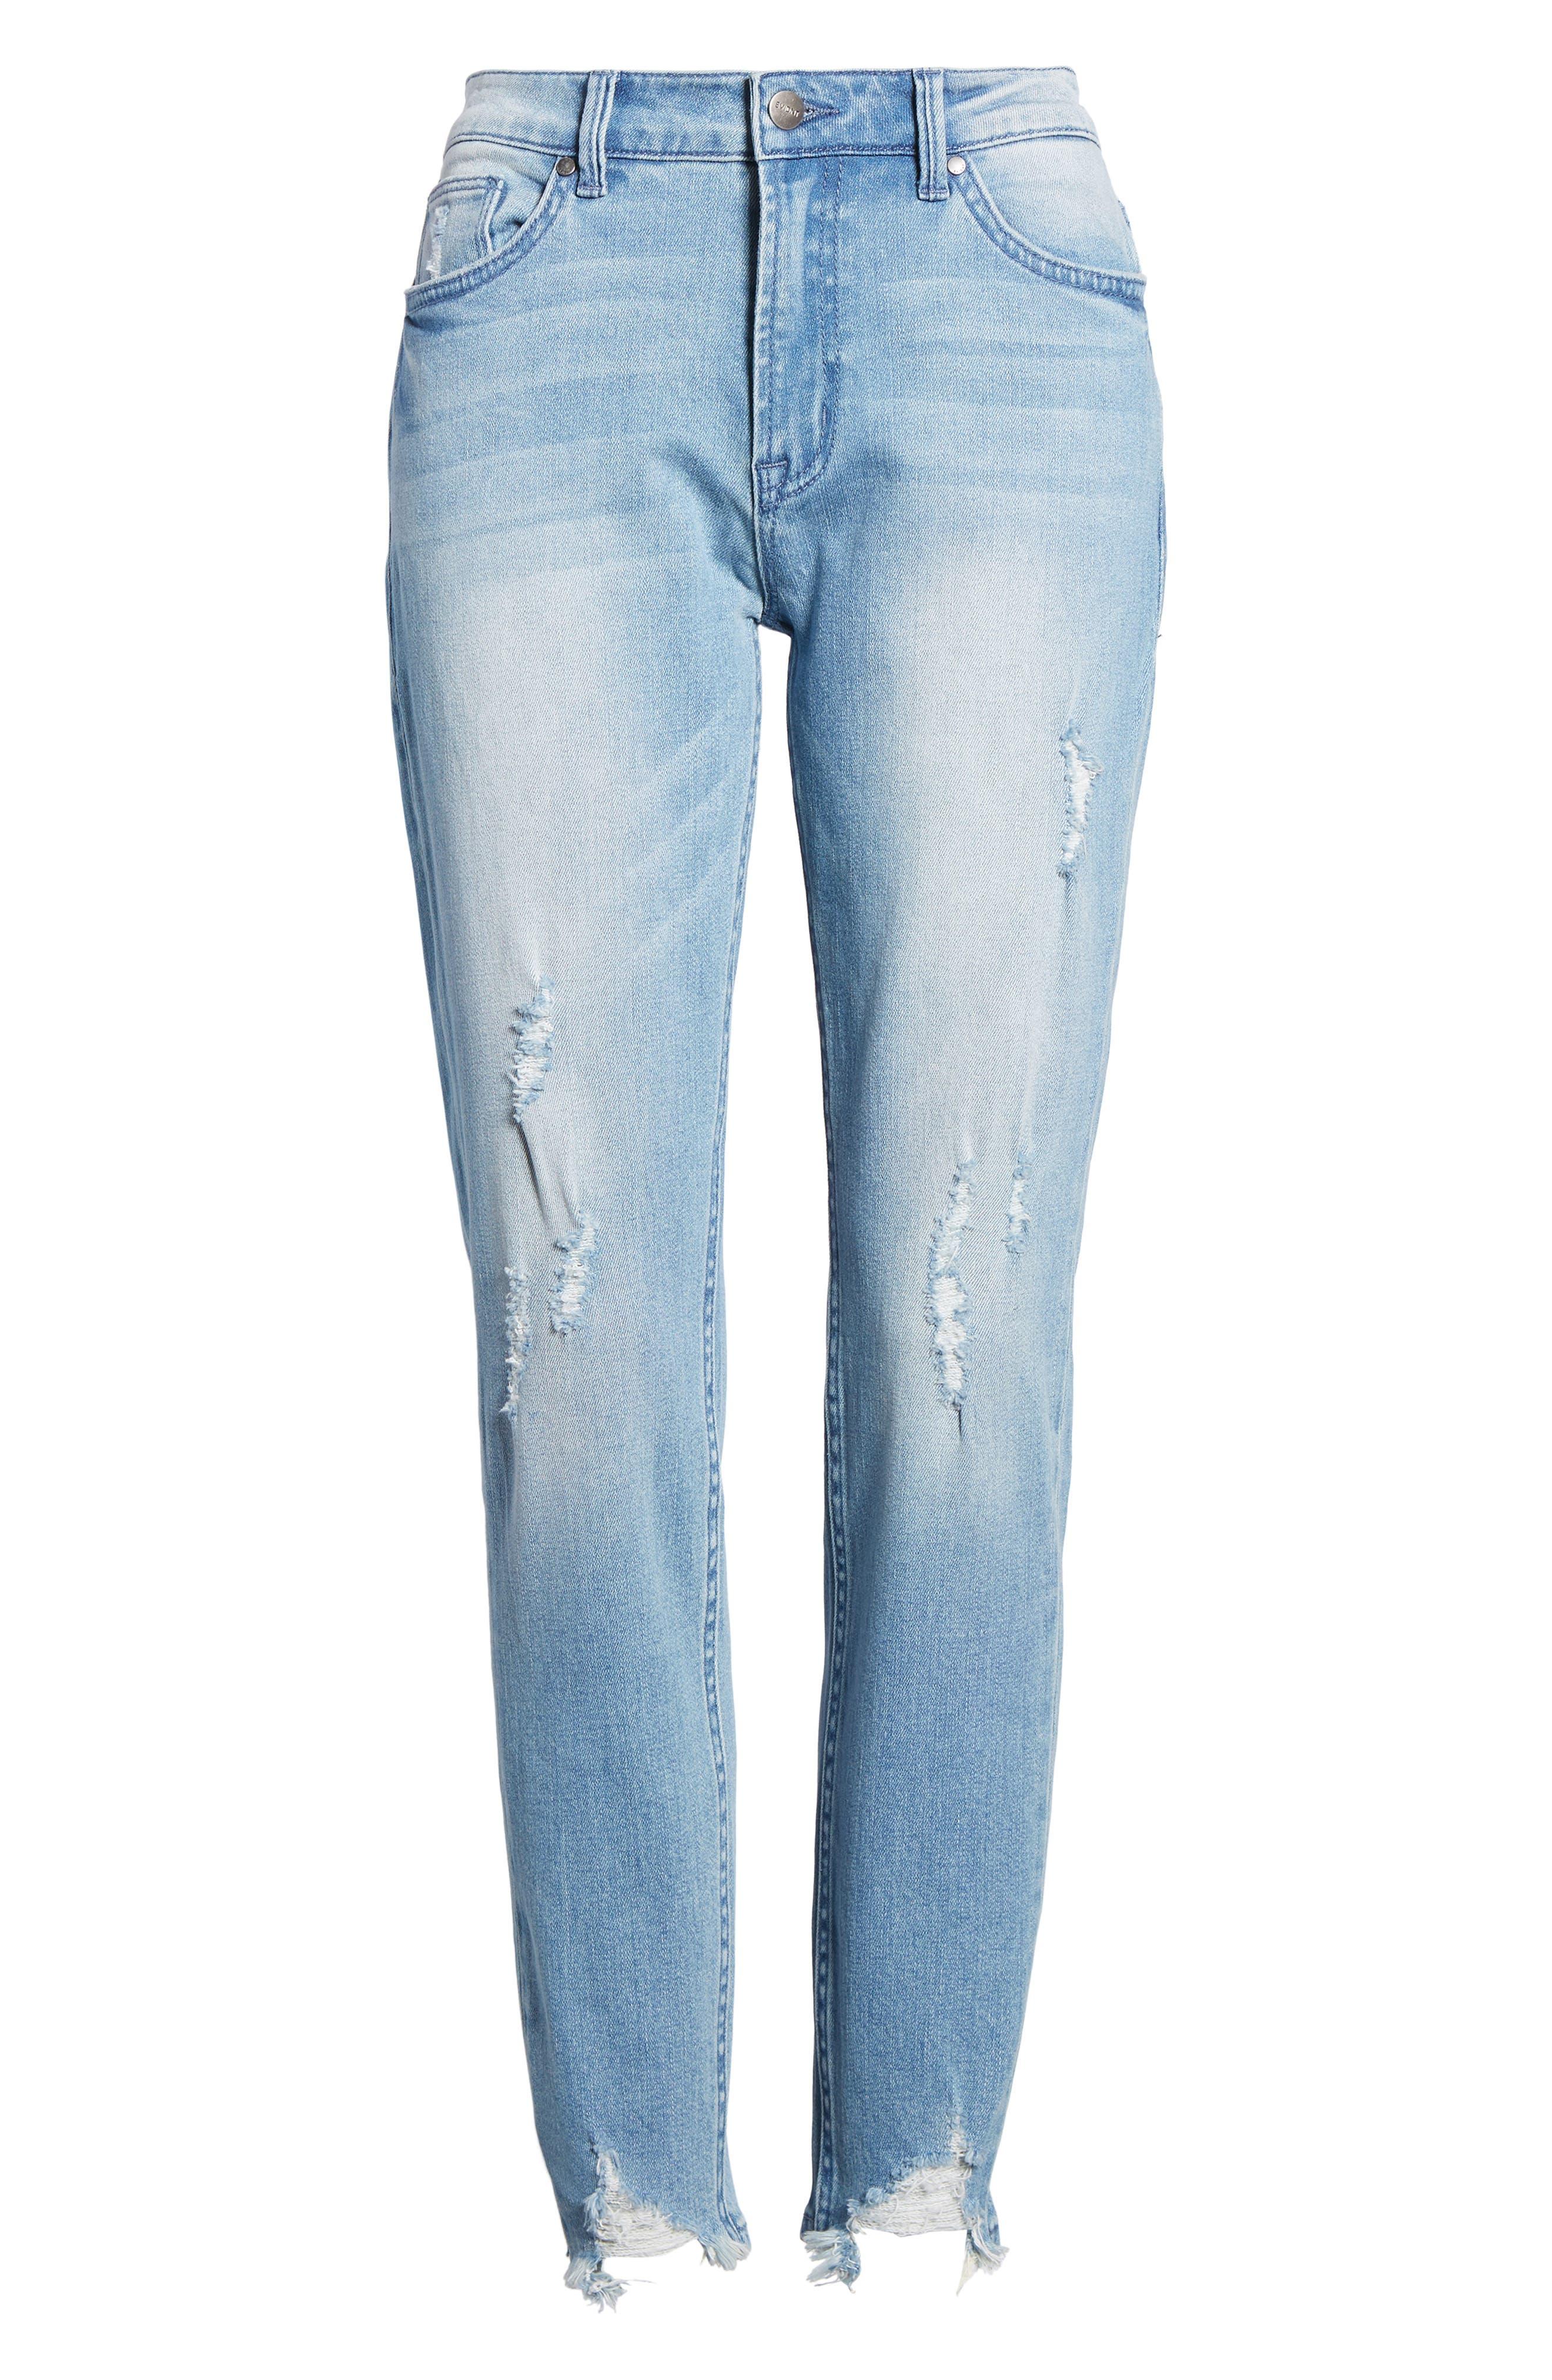 Verona Skinny Jeans,                             Alternate thumbnail 7, color,                             403